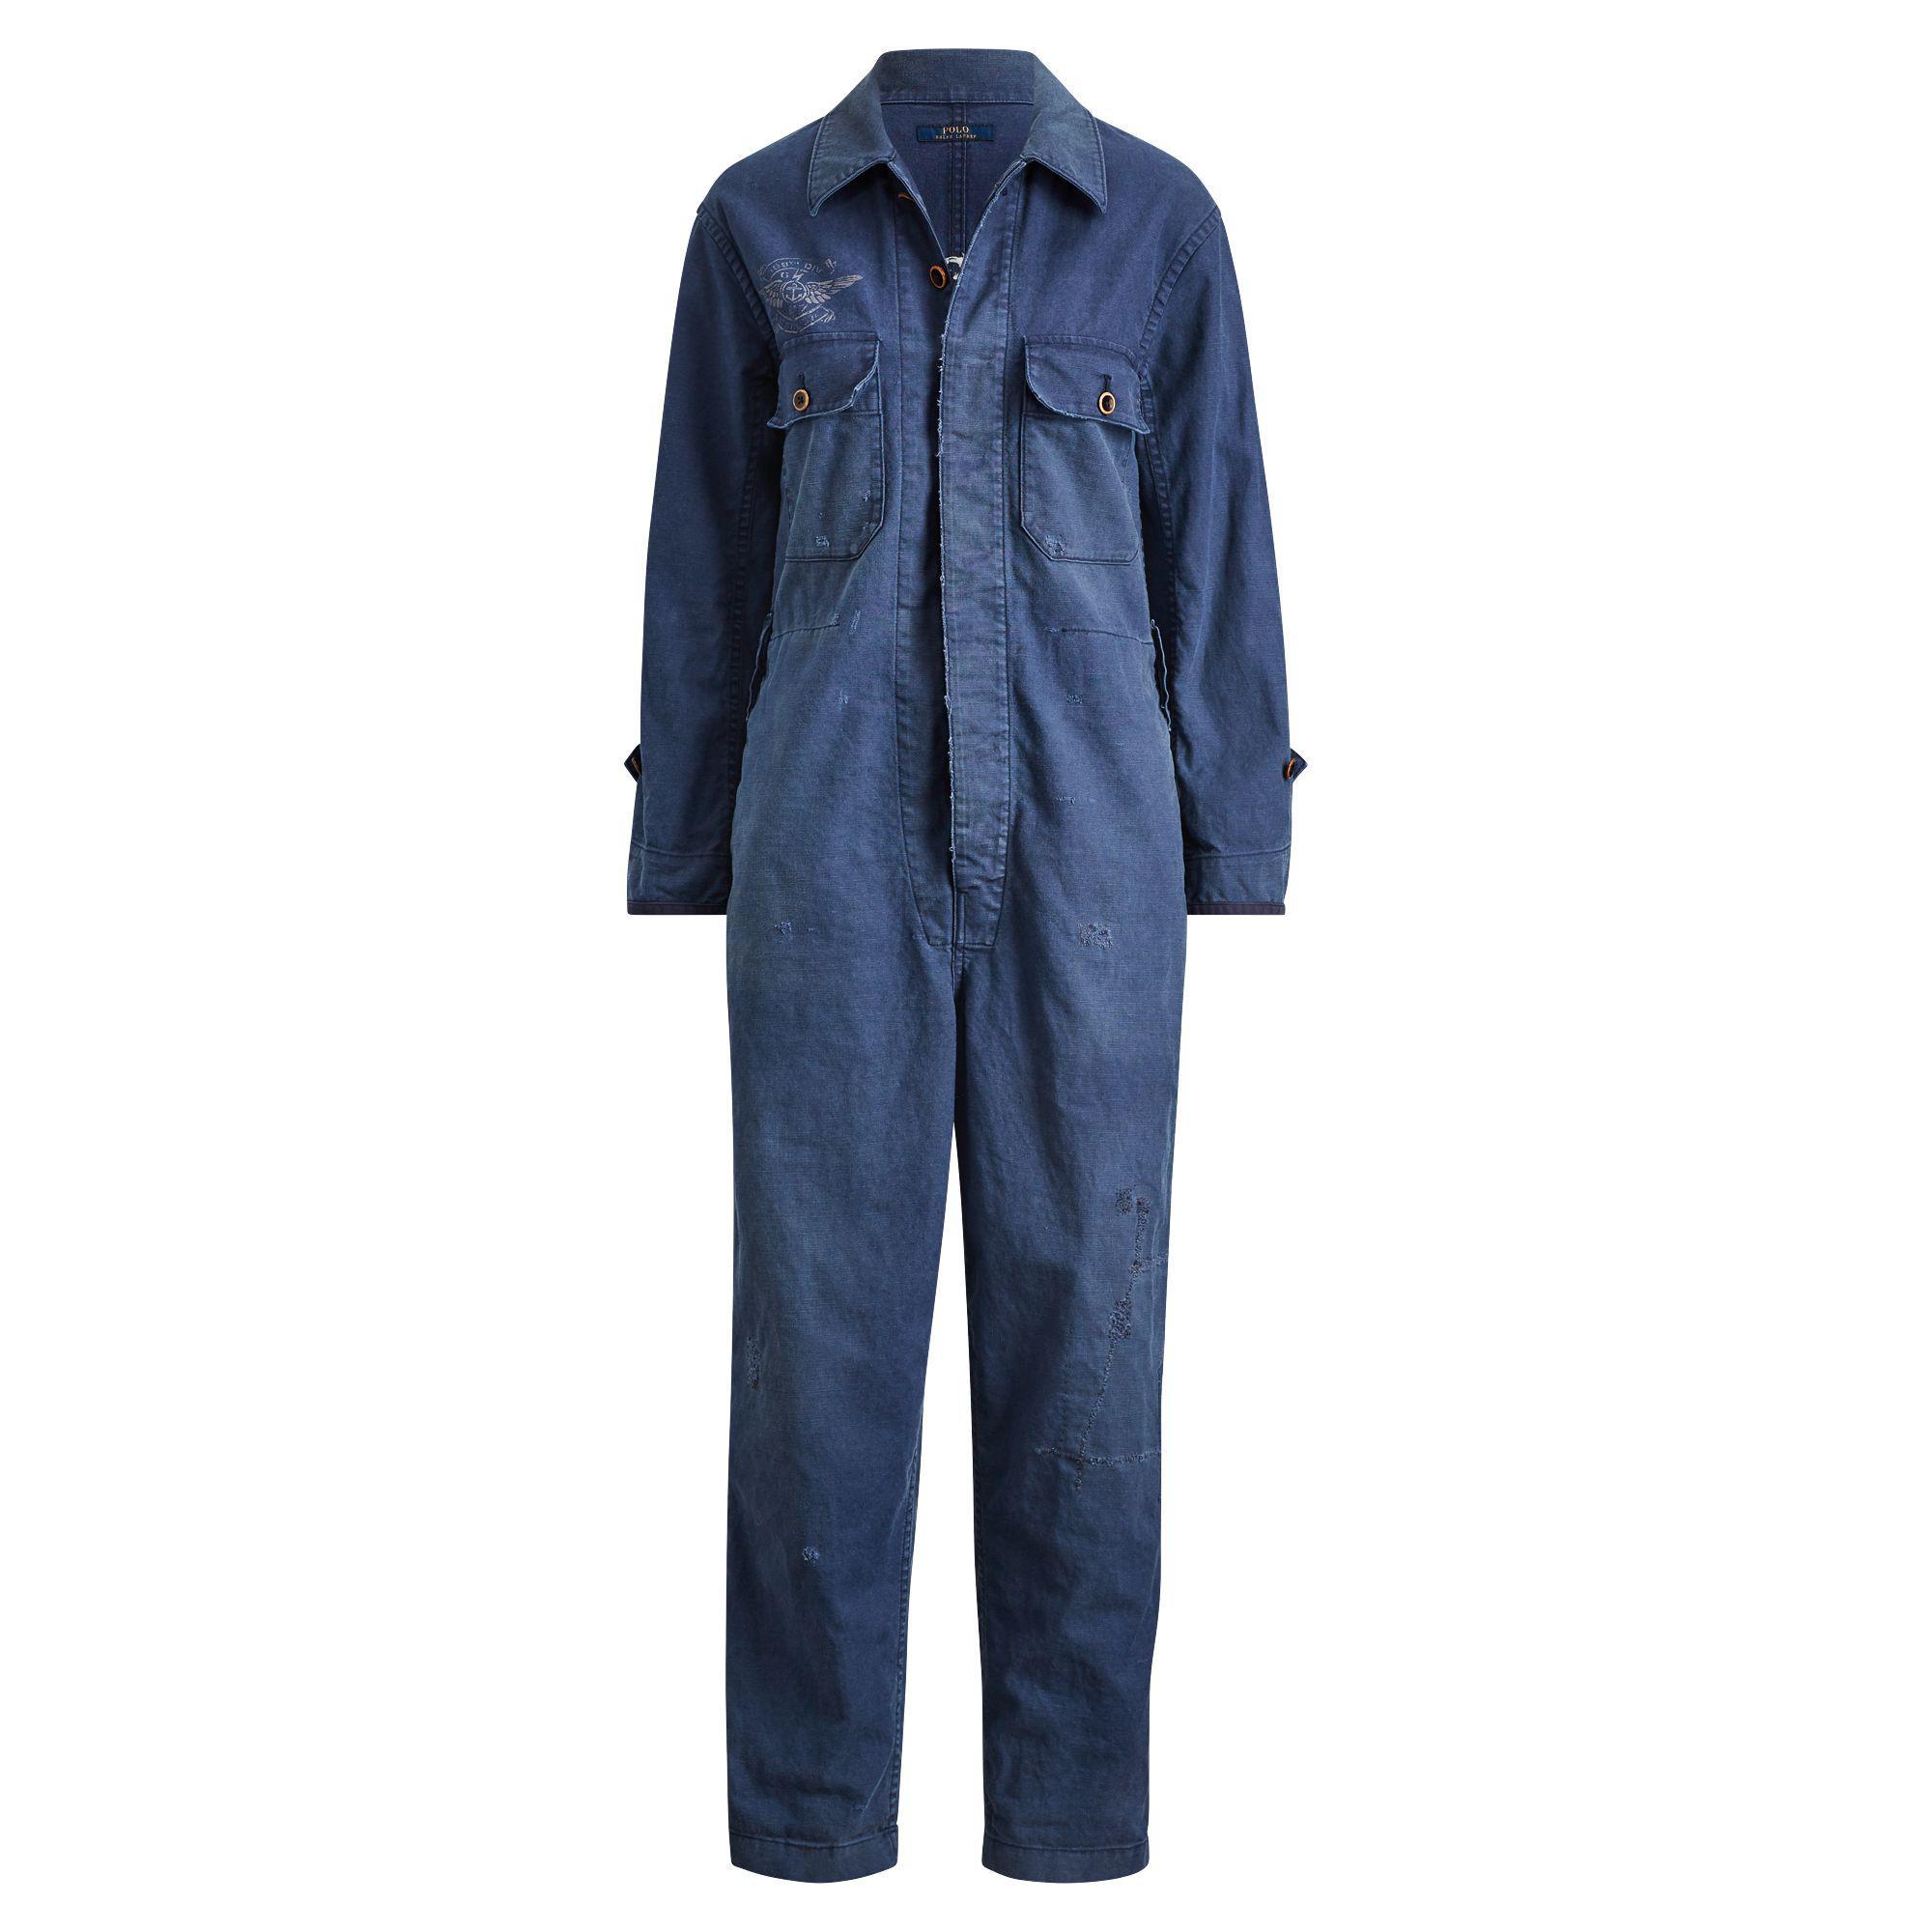 b77382e39ef451 Lyst - Polo Ralph Lauren Linen-blend Jumpsuit in Blue